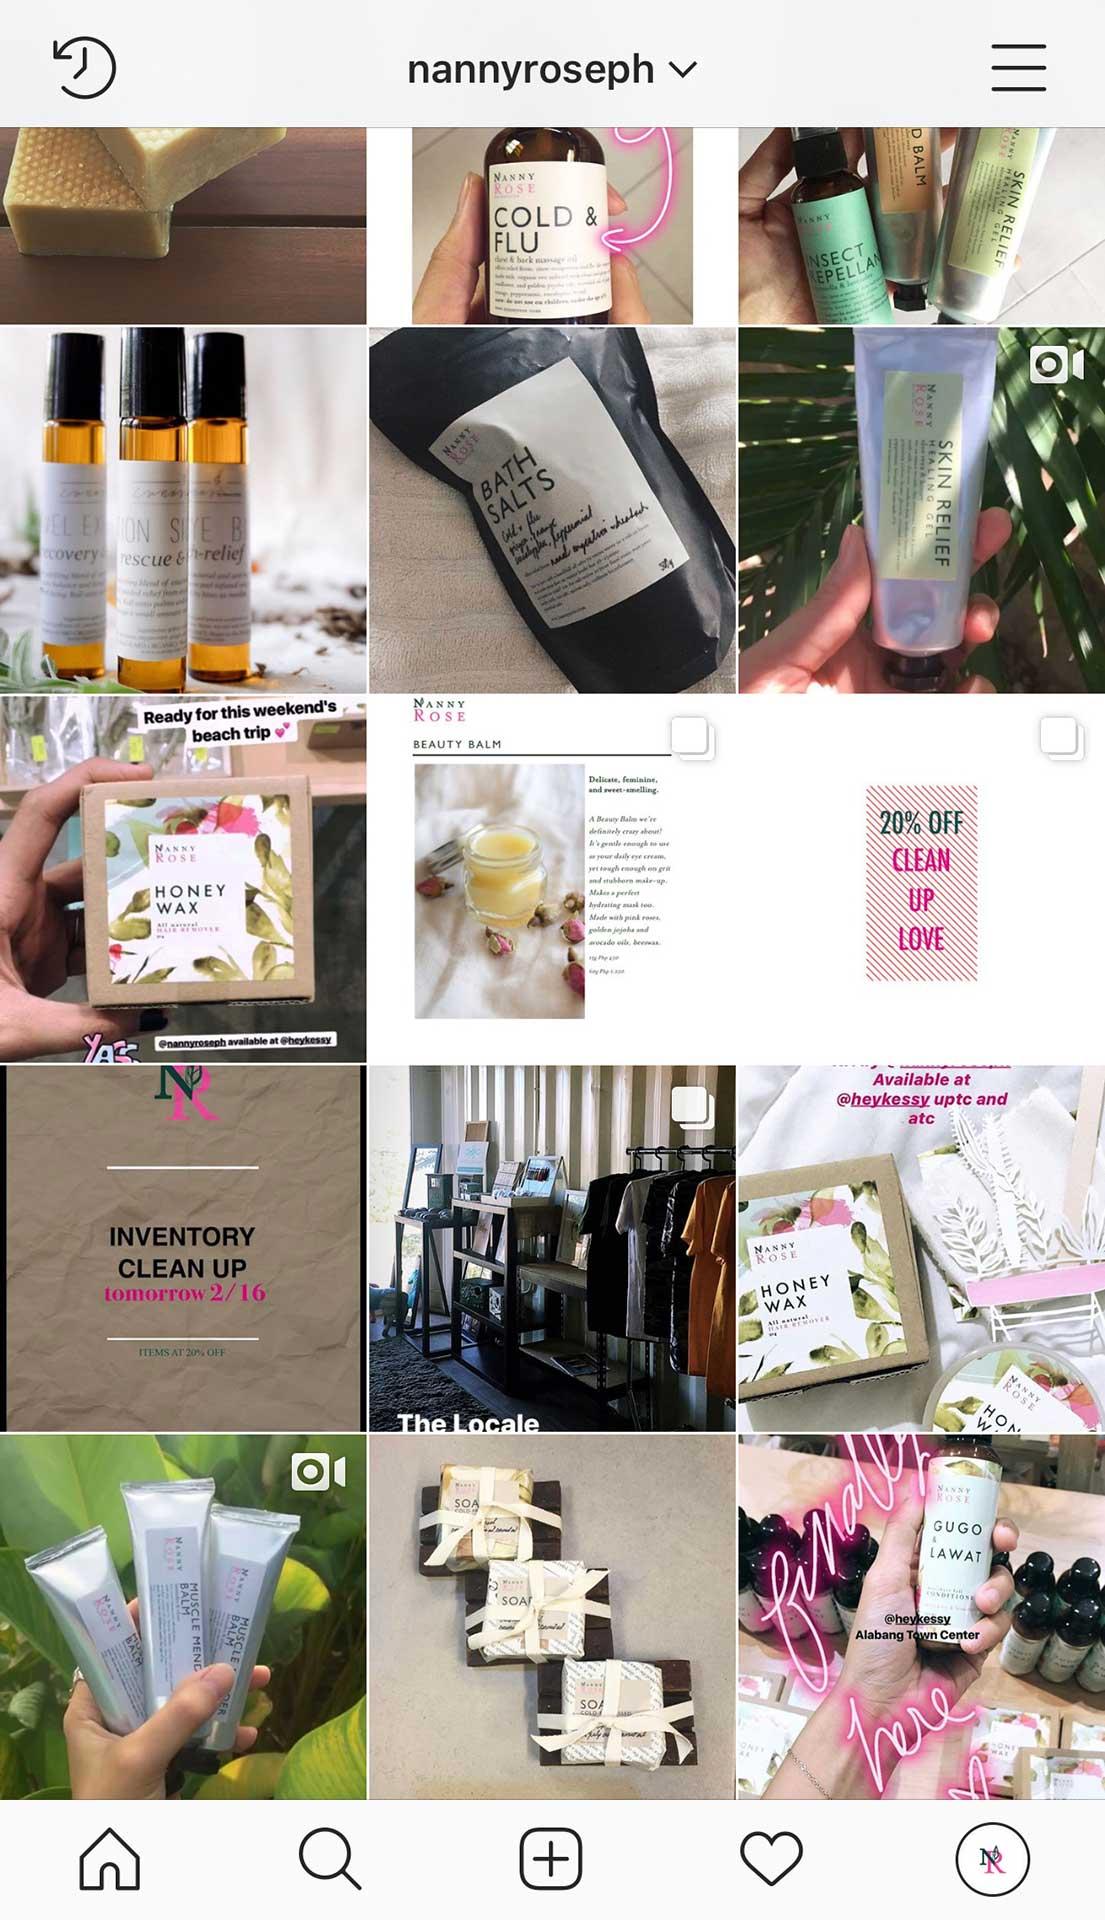 Instagram feed (before)